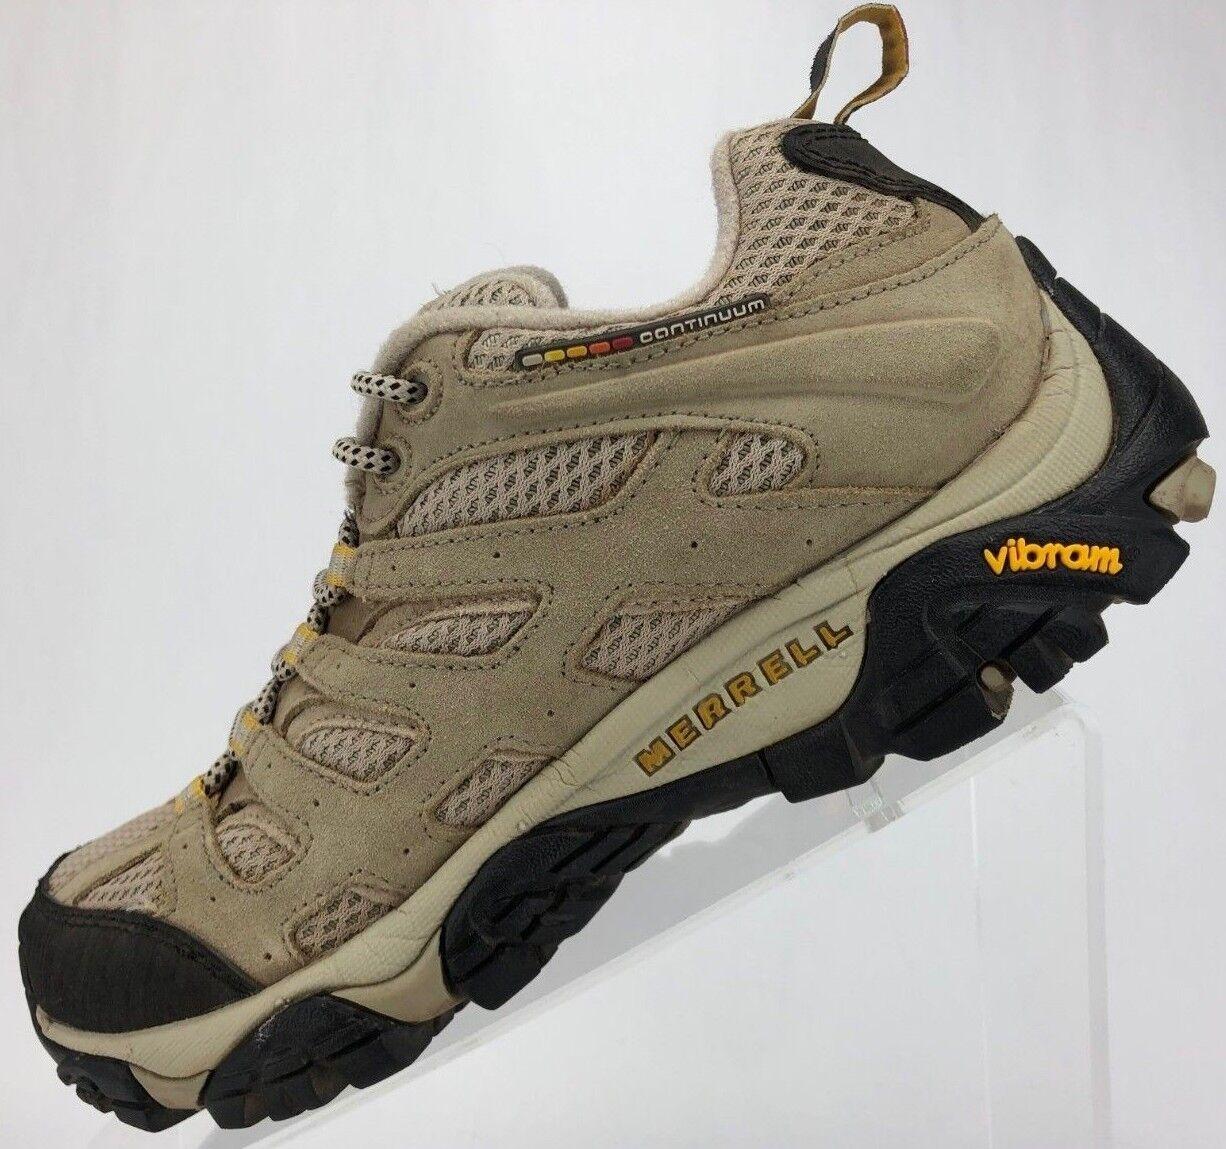 Merrell Moab Ventilator All Terrain Trail Hiking Walking Sneakers Womens 8 Taupe